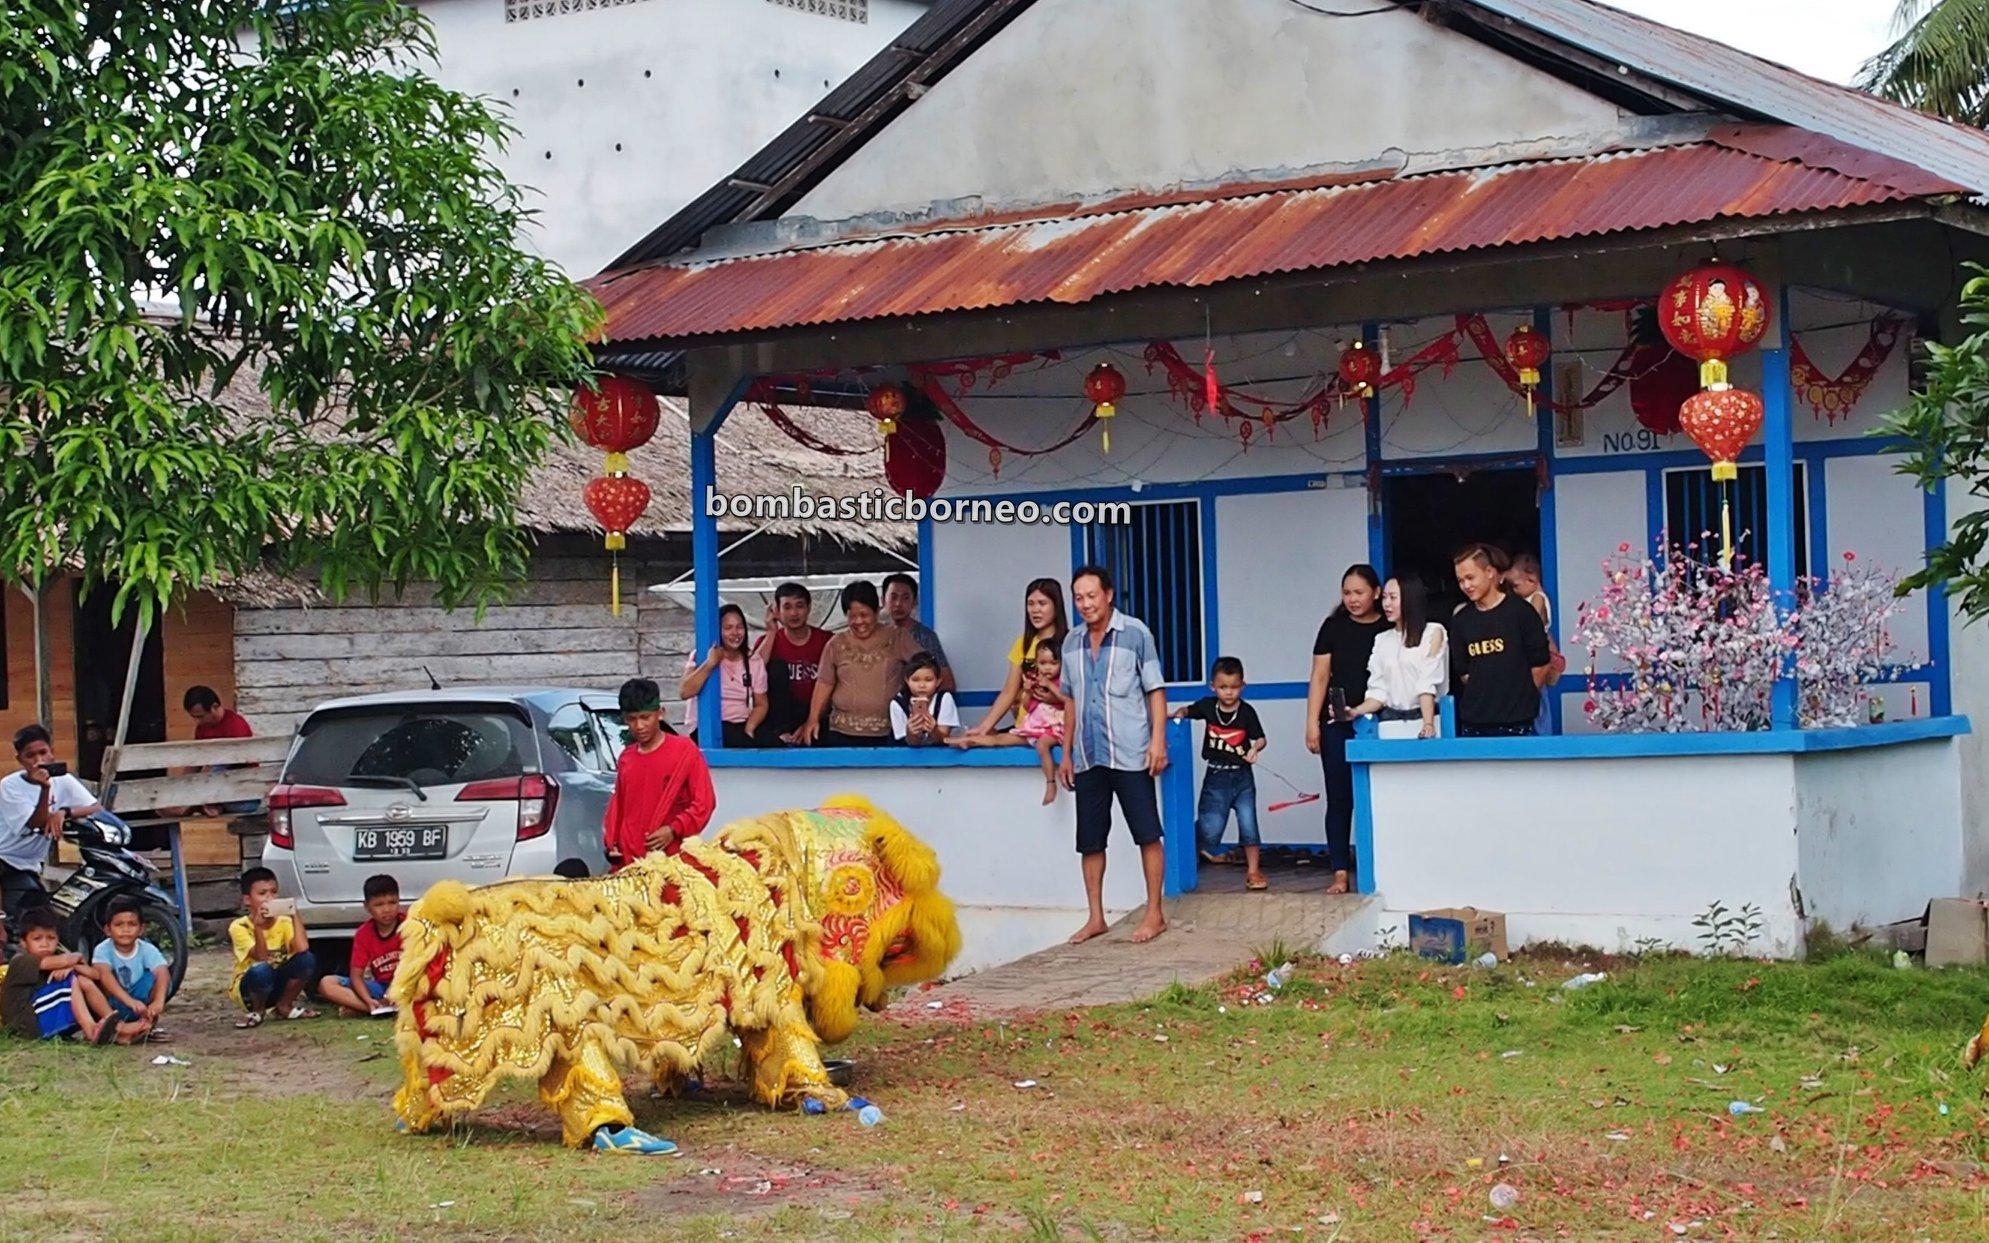 tahun baru imlek, chinese new year, traditional, Sambas, Indonesia, West Kalimantan, Sentebang, Jawai Selatan, Tourism, travel guide, Borneo, culture, budaya,